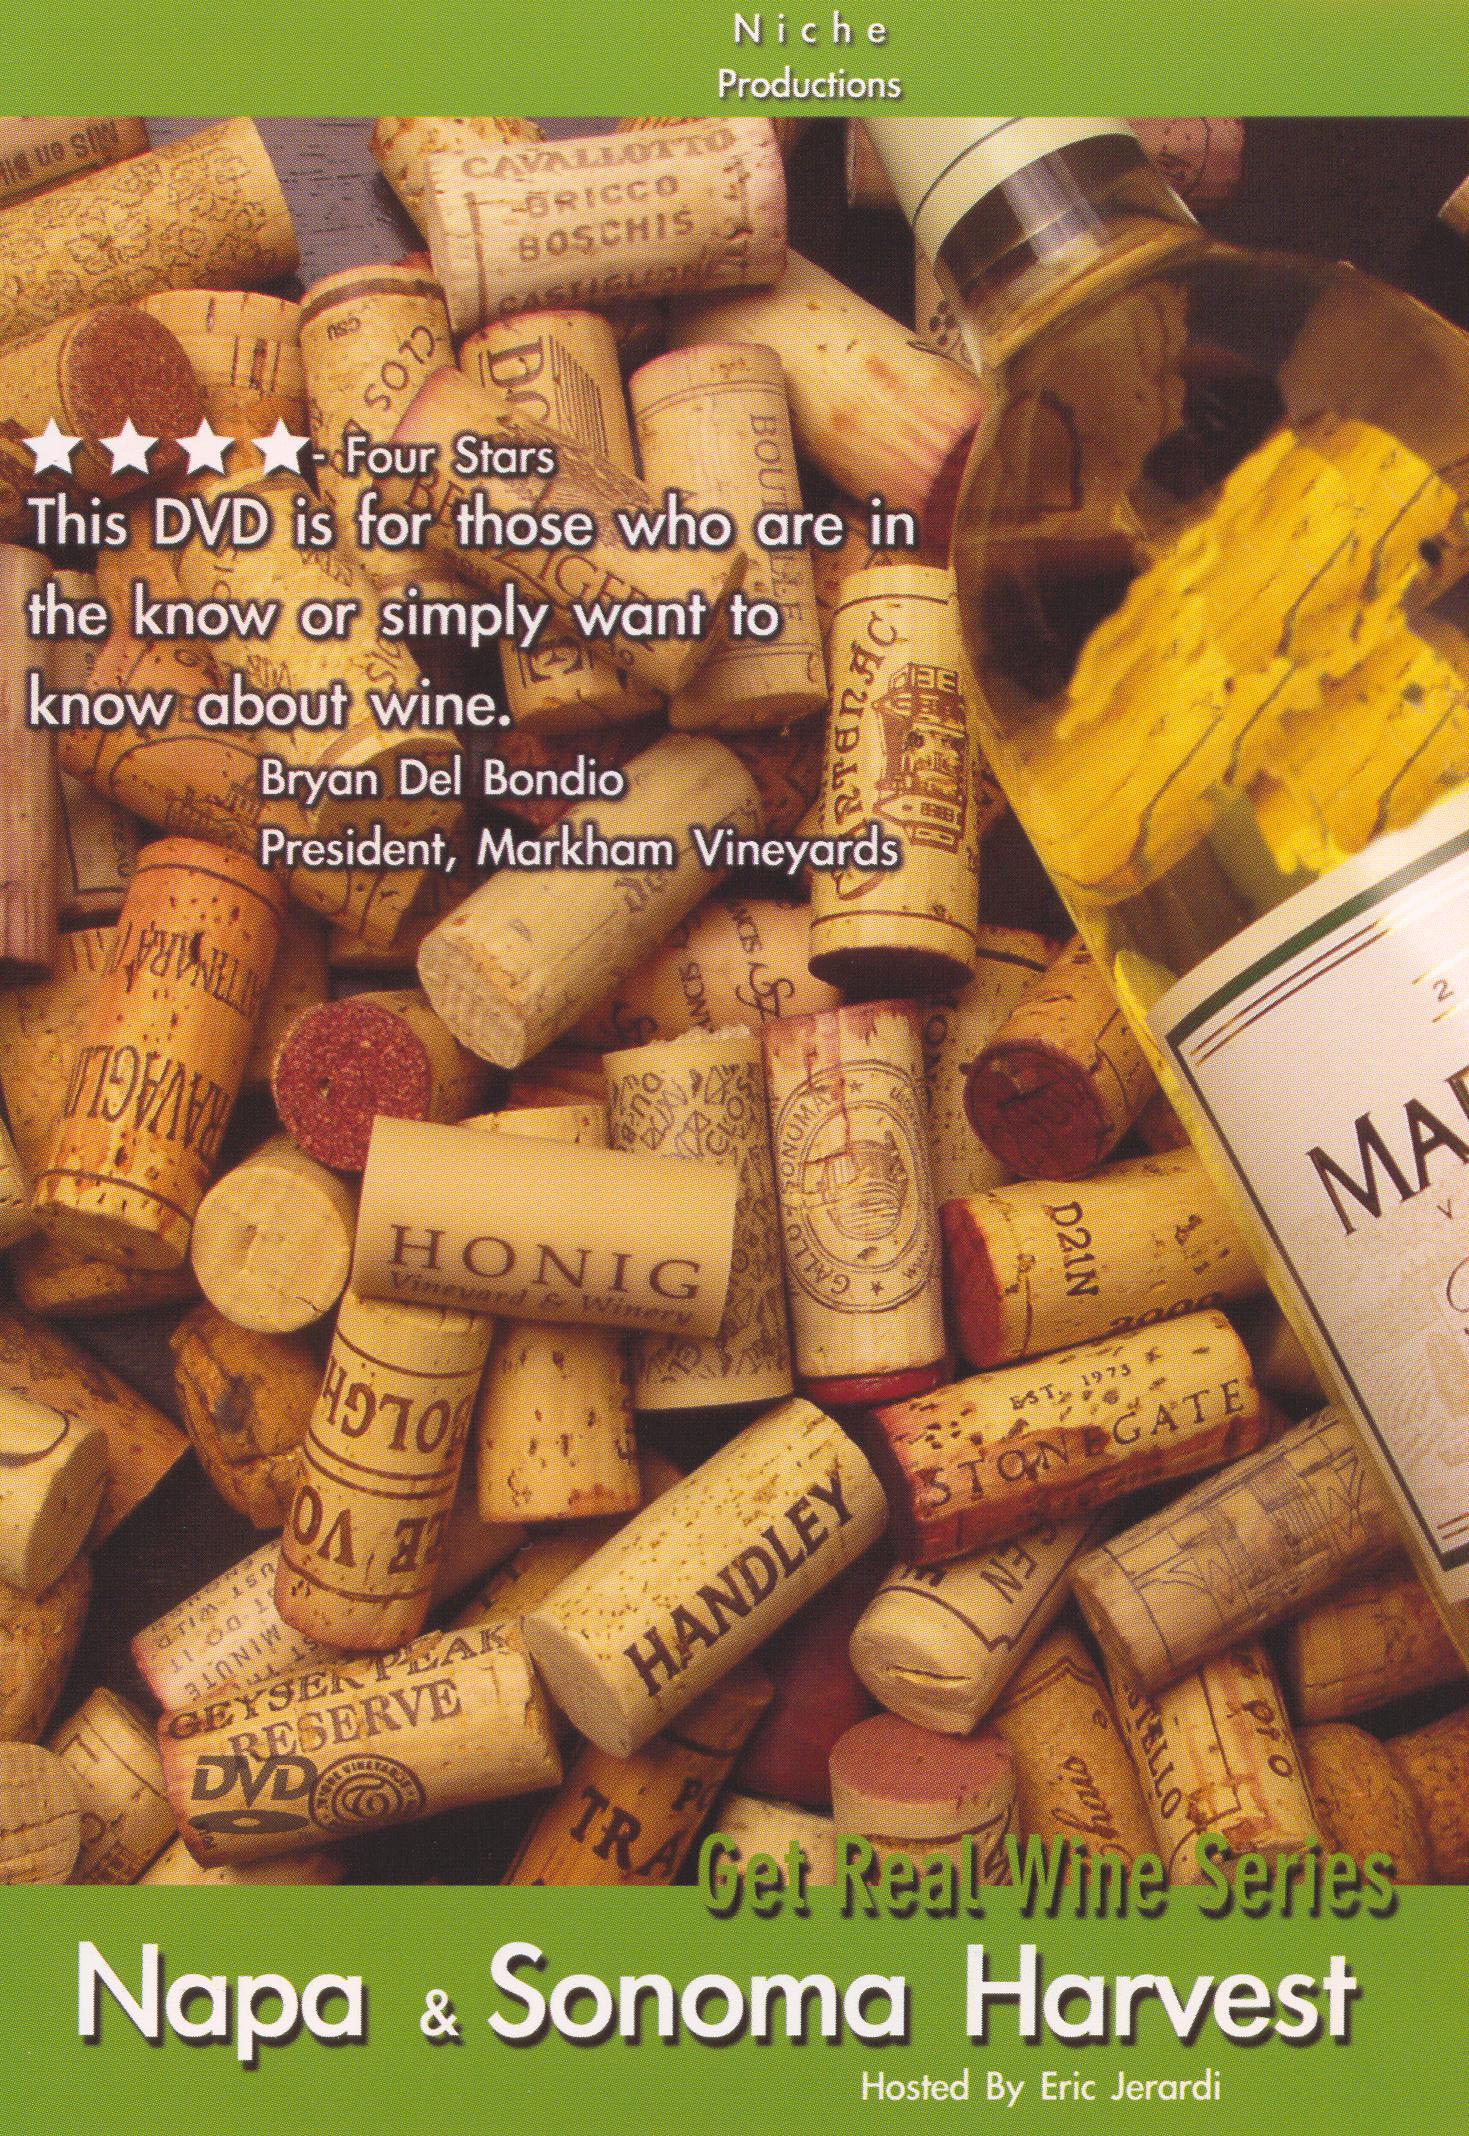 Eric Jerardi: Get Real Wine Series - Napa and Sonoma Harvest